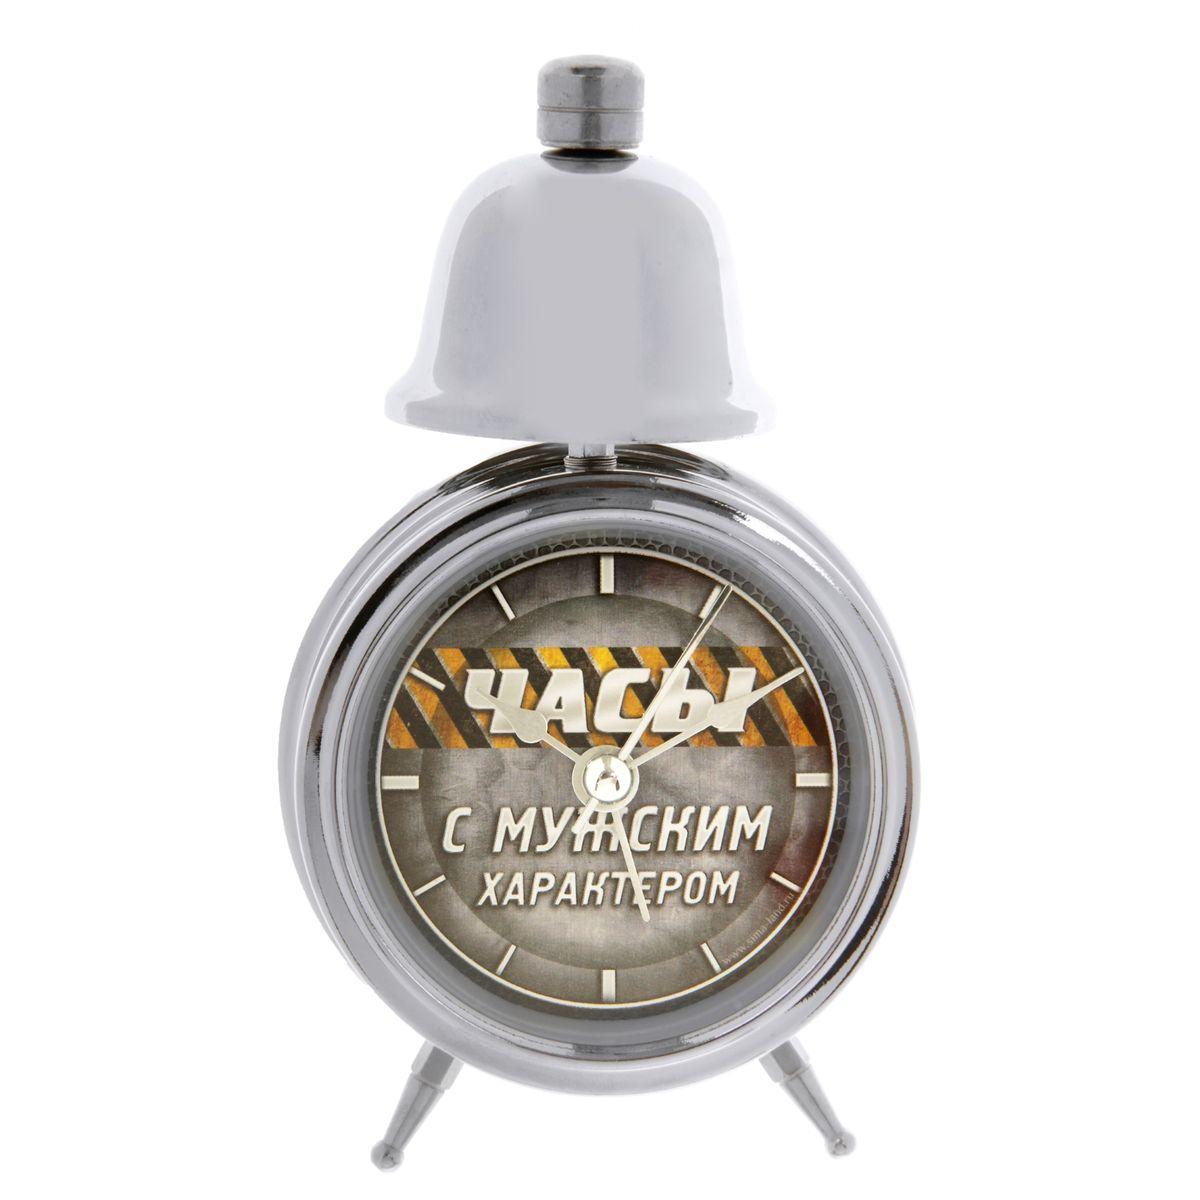 Часы-будильник Sima-land Часы с мужским характером часы будильник sima land мгновение